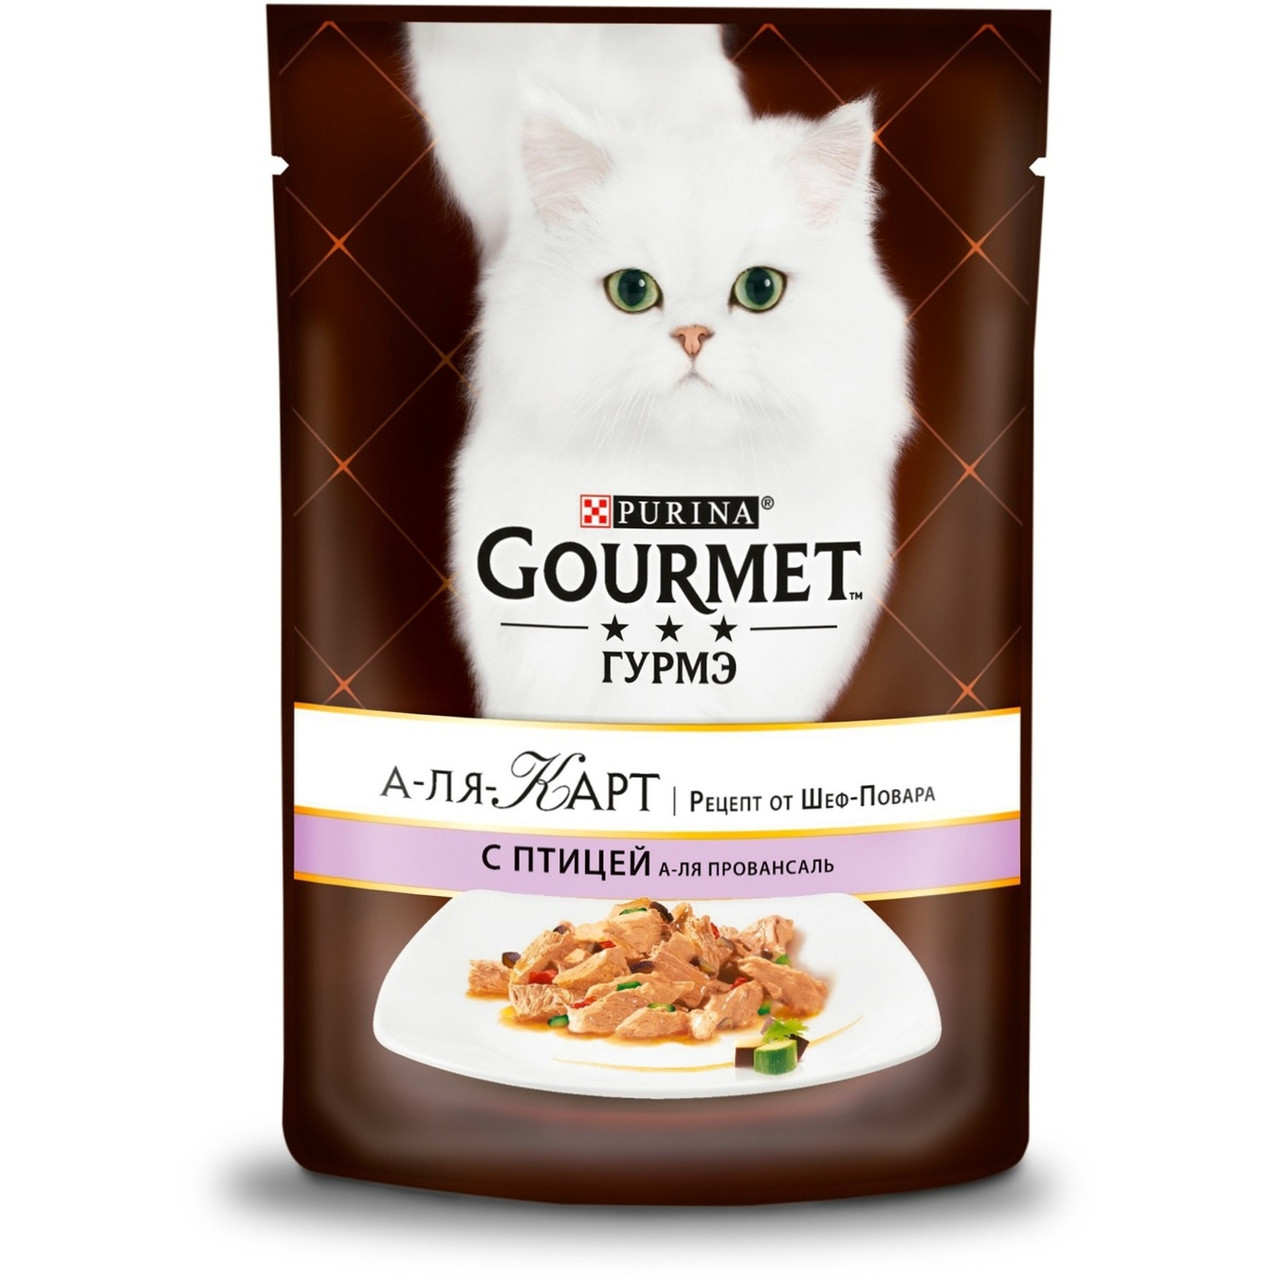 Gourmet А-ля Карт с птицей, пауч 85гр.